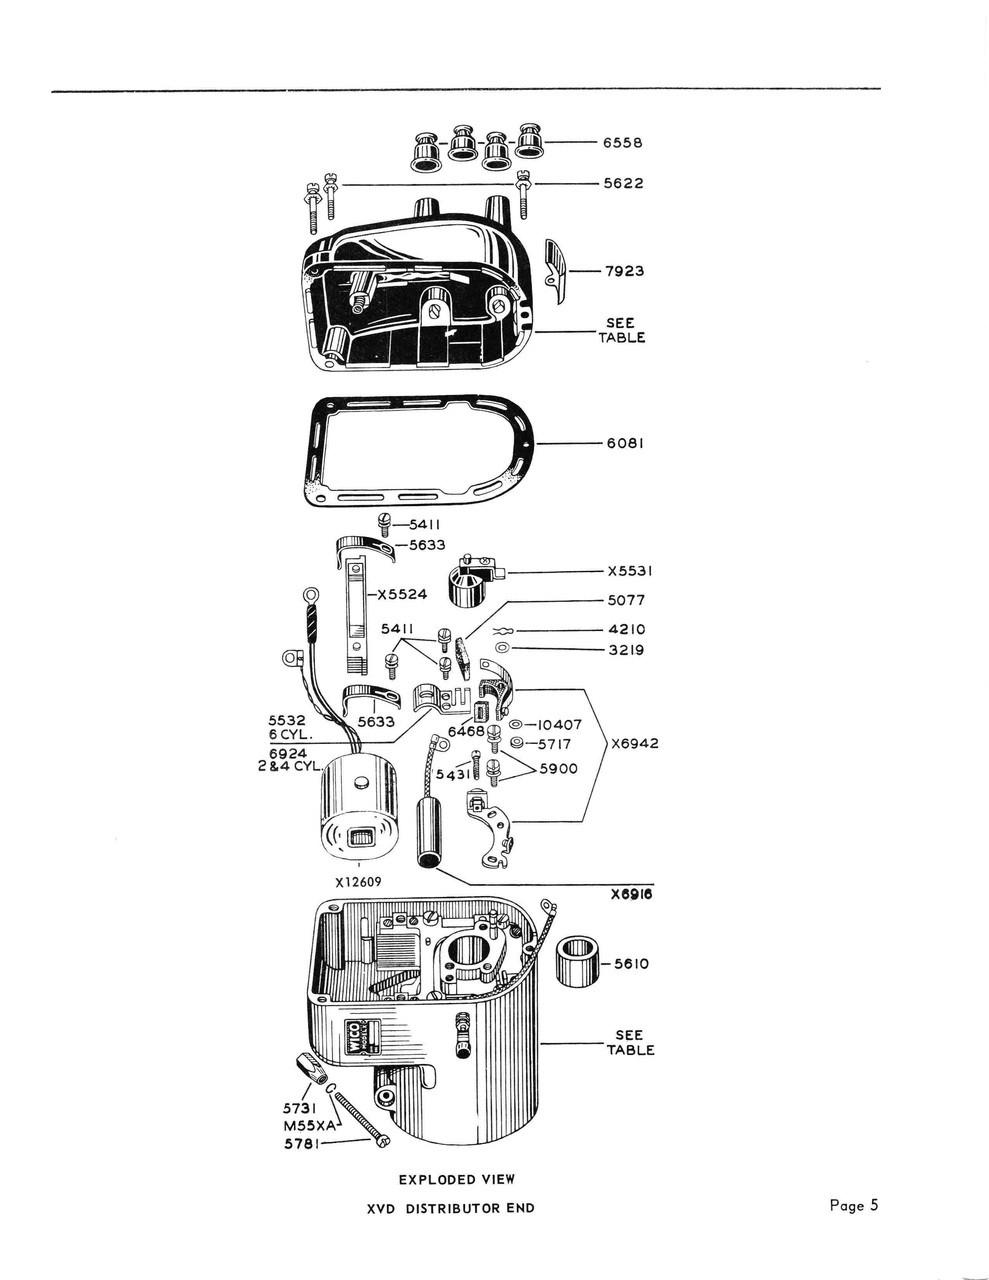 wico magneto diagram simple wiring schema john deere wico magneto wico  magneto diagram wiring diagram library